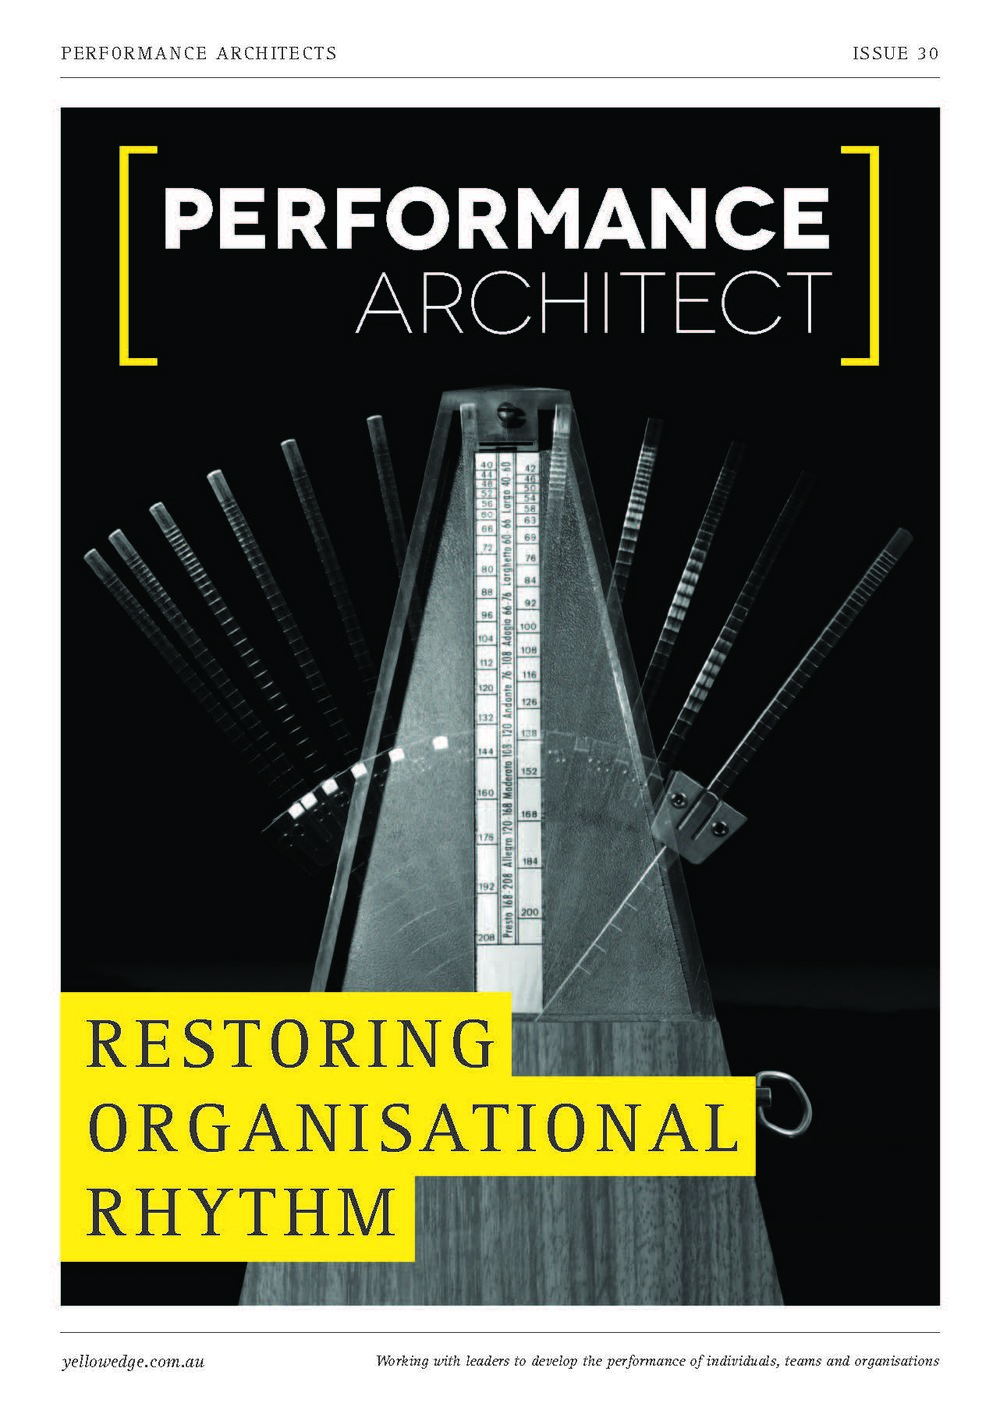 Restoring organisational rhythm